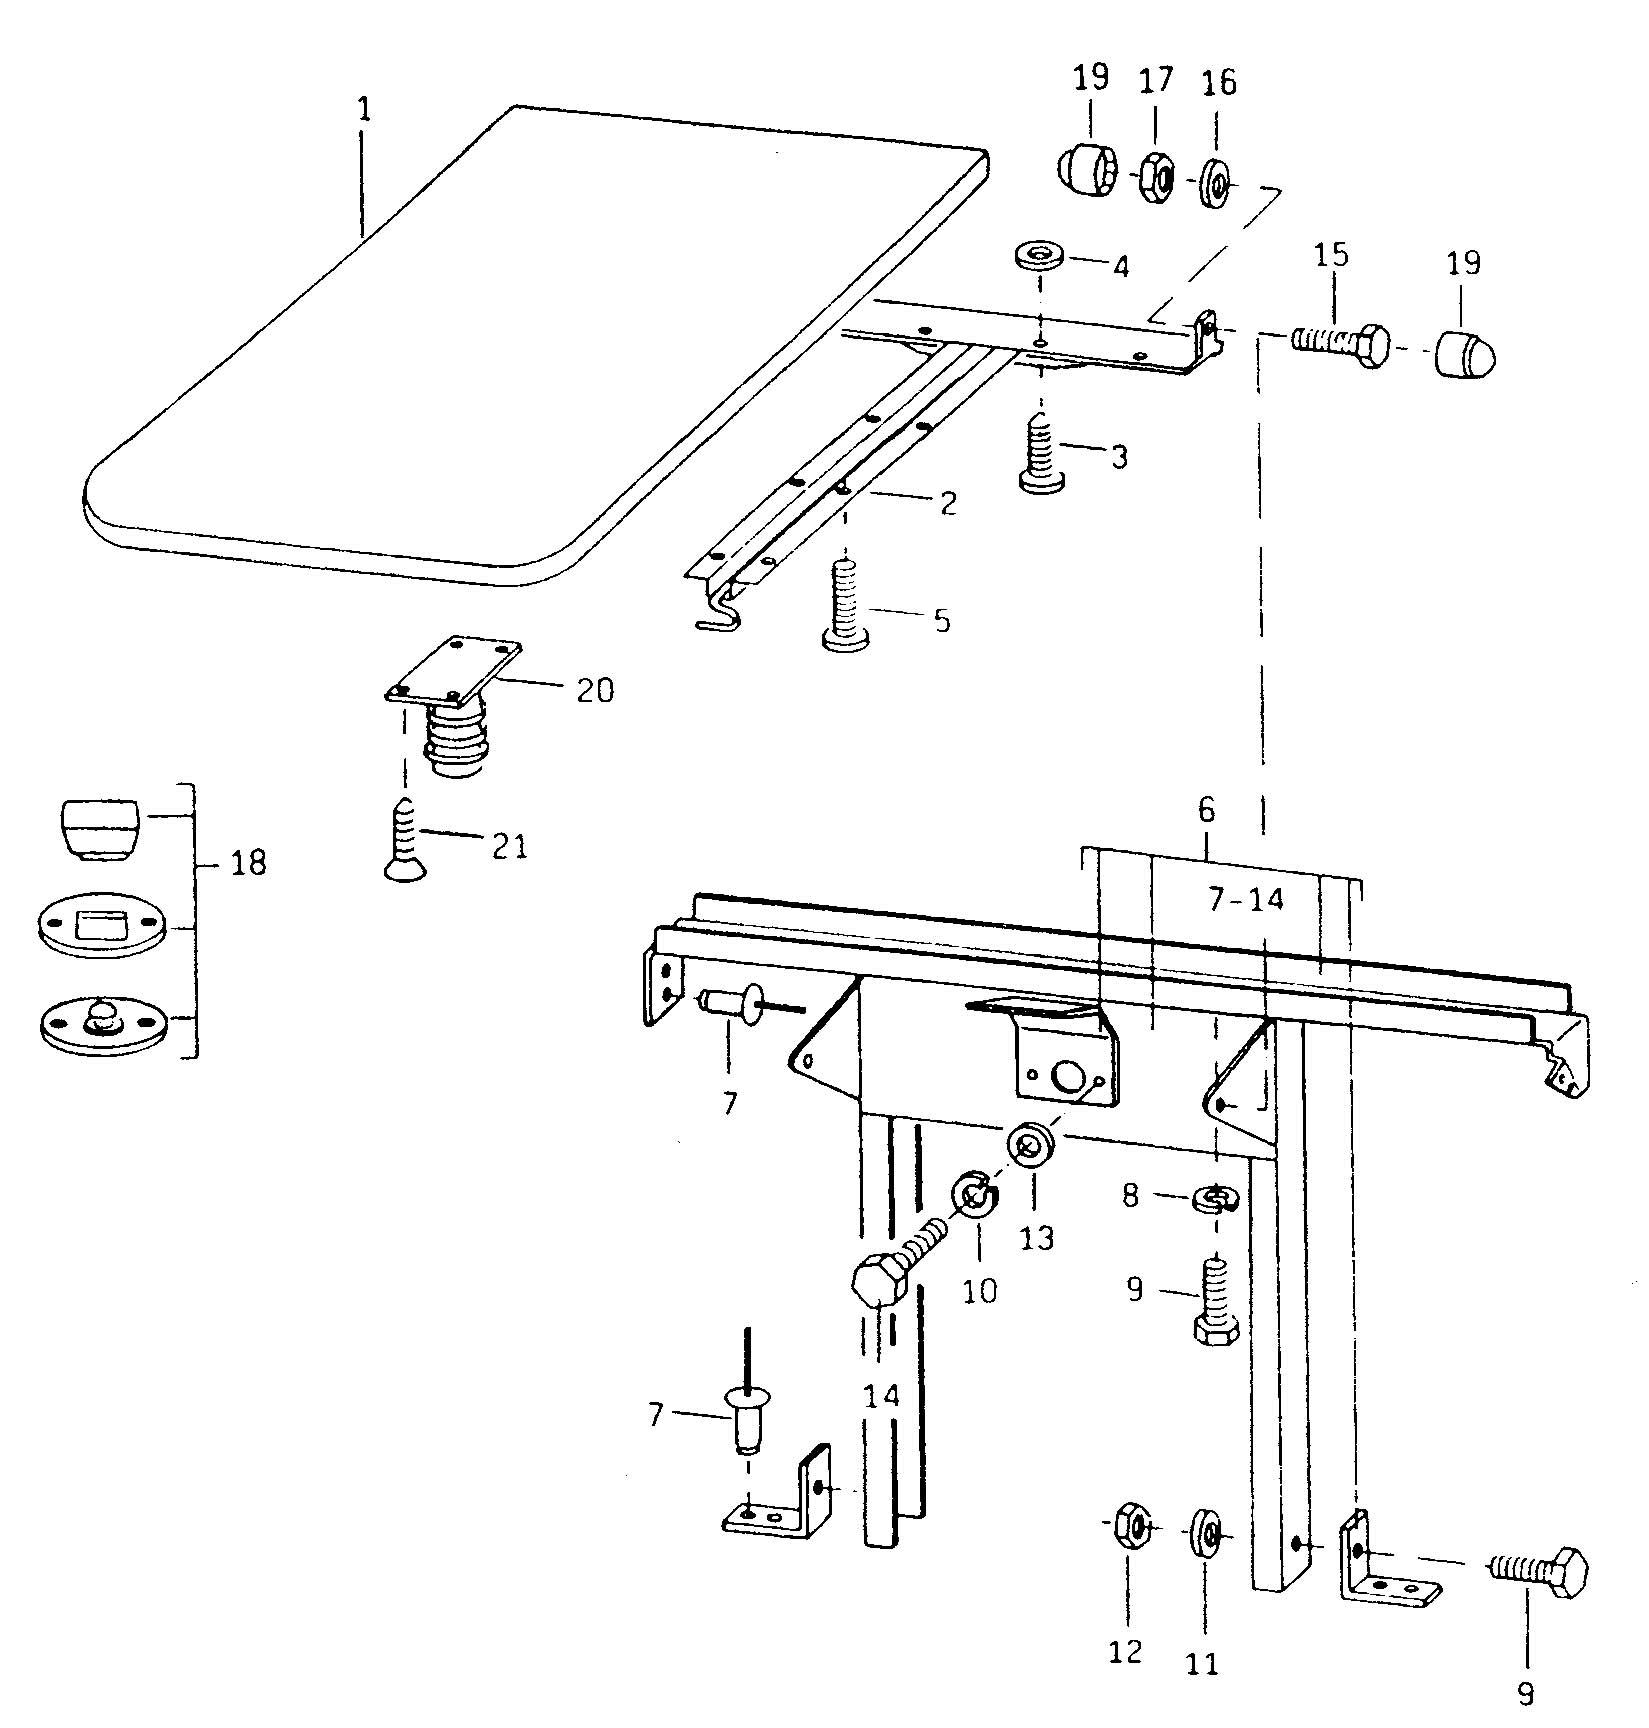 western 1000 salt spreader wiring diagram clarion radio va golf cart and fuse box